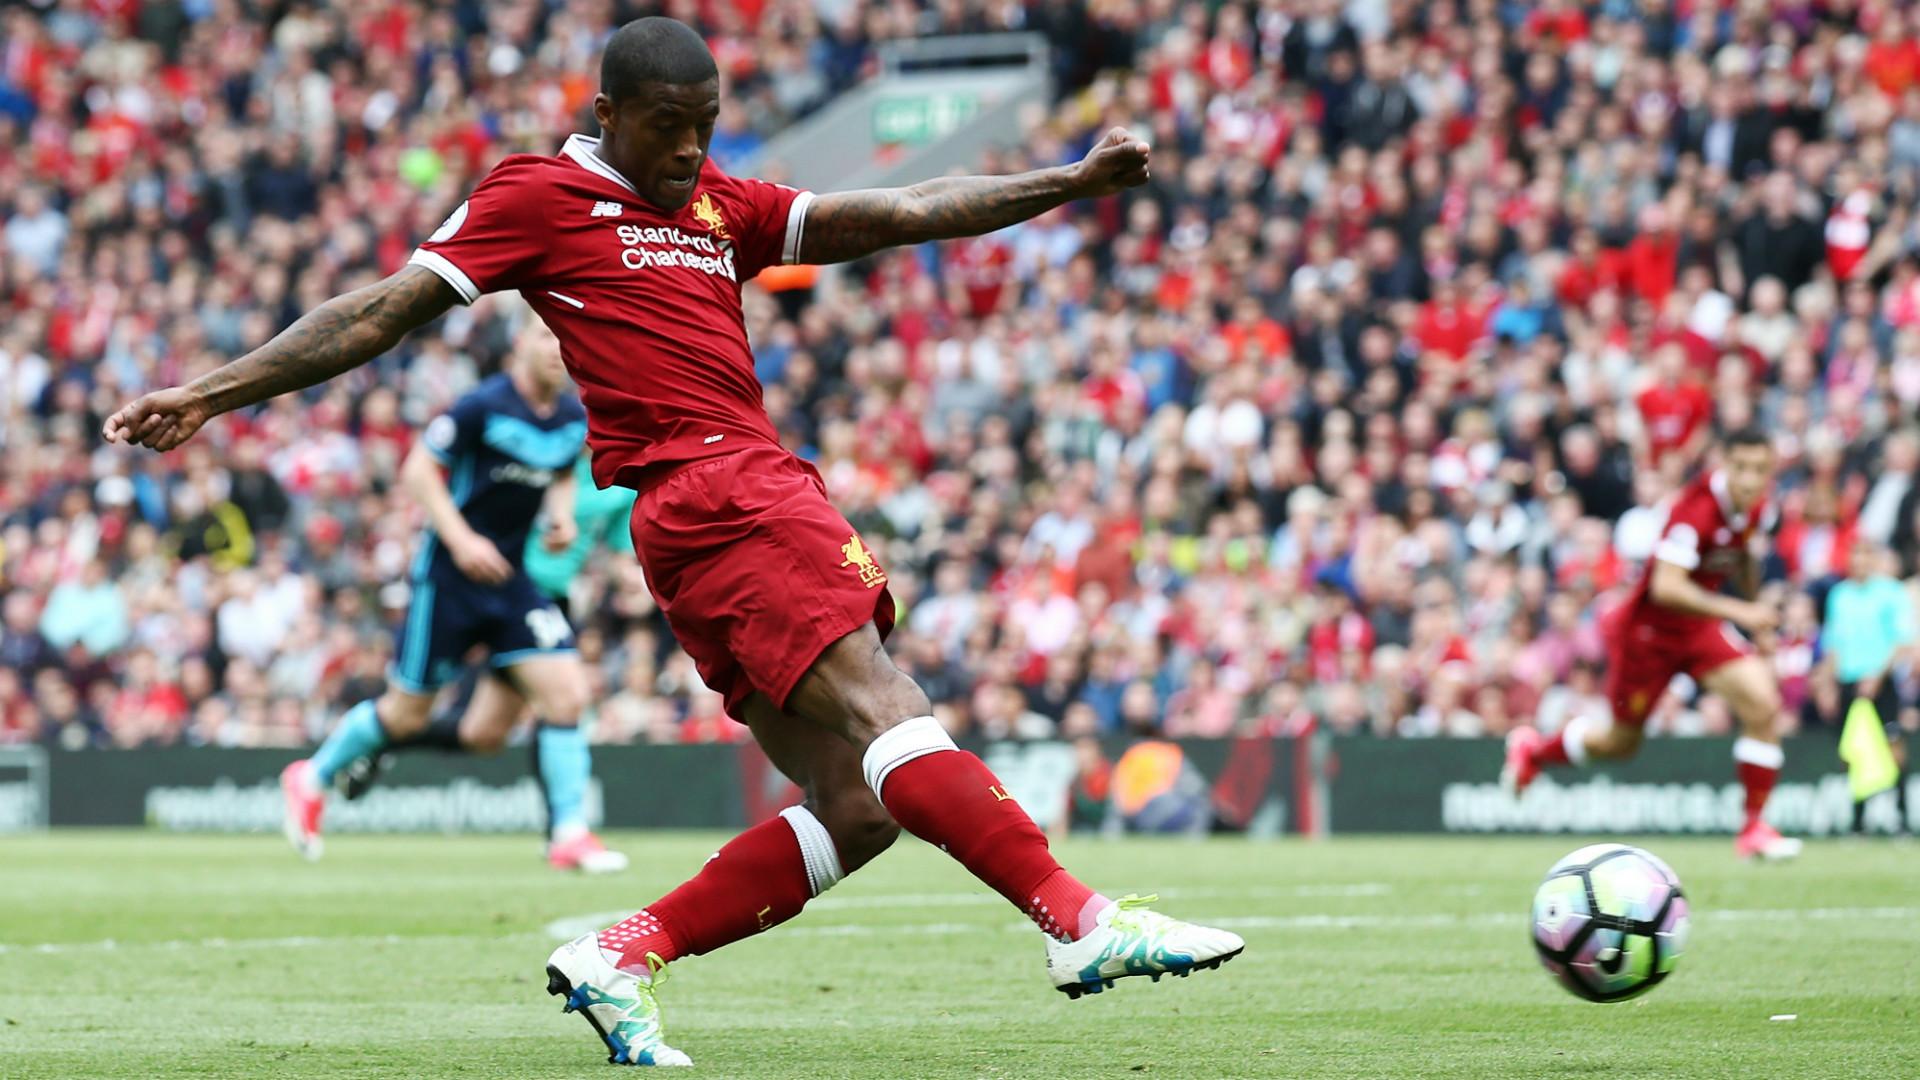 HD Gini Wijnaldum goal v Middlesbrough